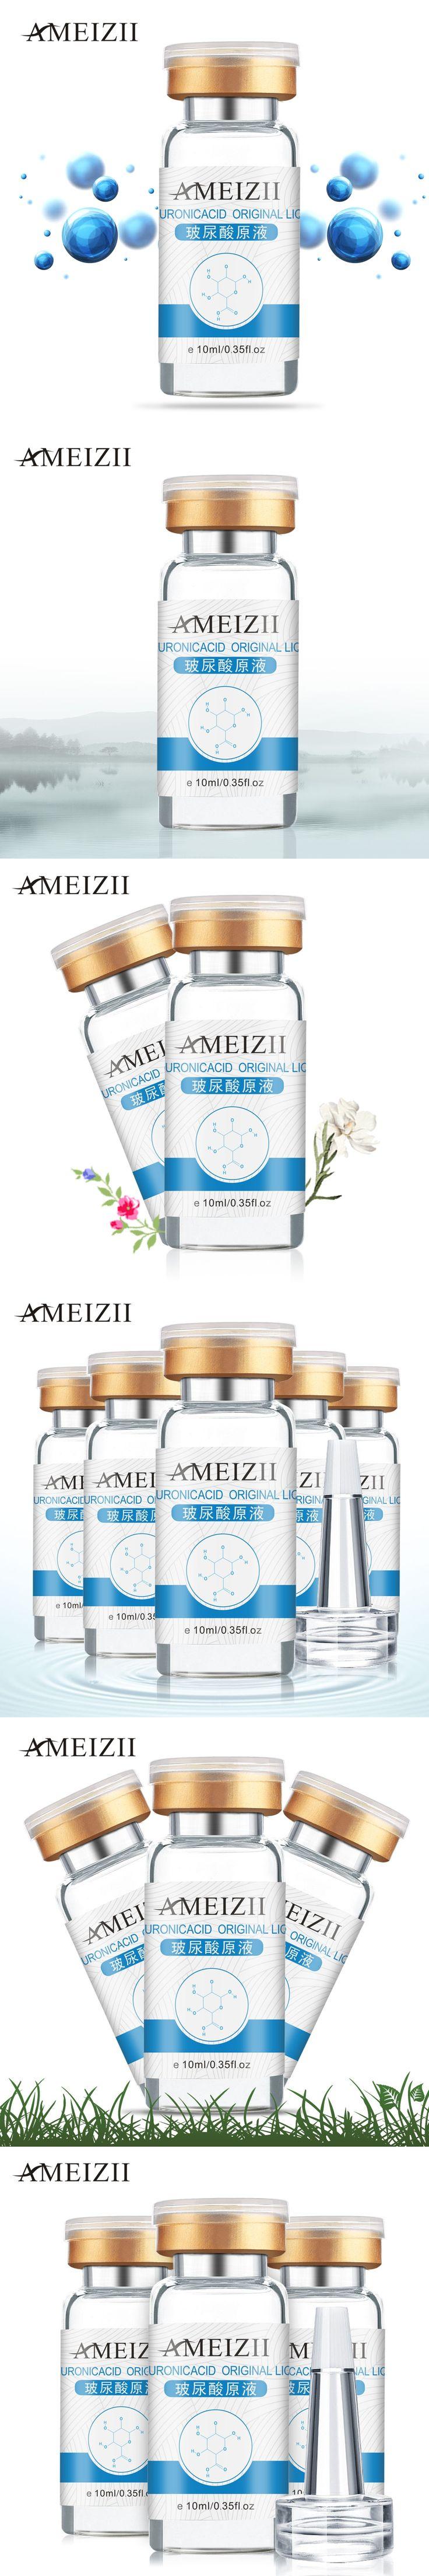 AMEIZII 10ml Pure Hyaluronic Acid Liquid Skin care Moisturizing Whitening Snail Repair Anti Wrinkle Cream Anti Aging Face Care